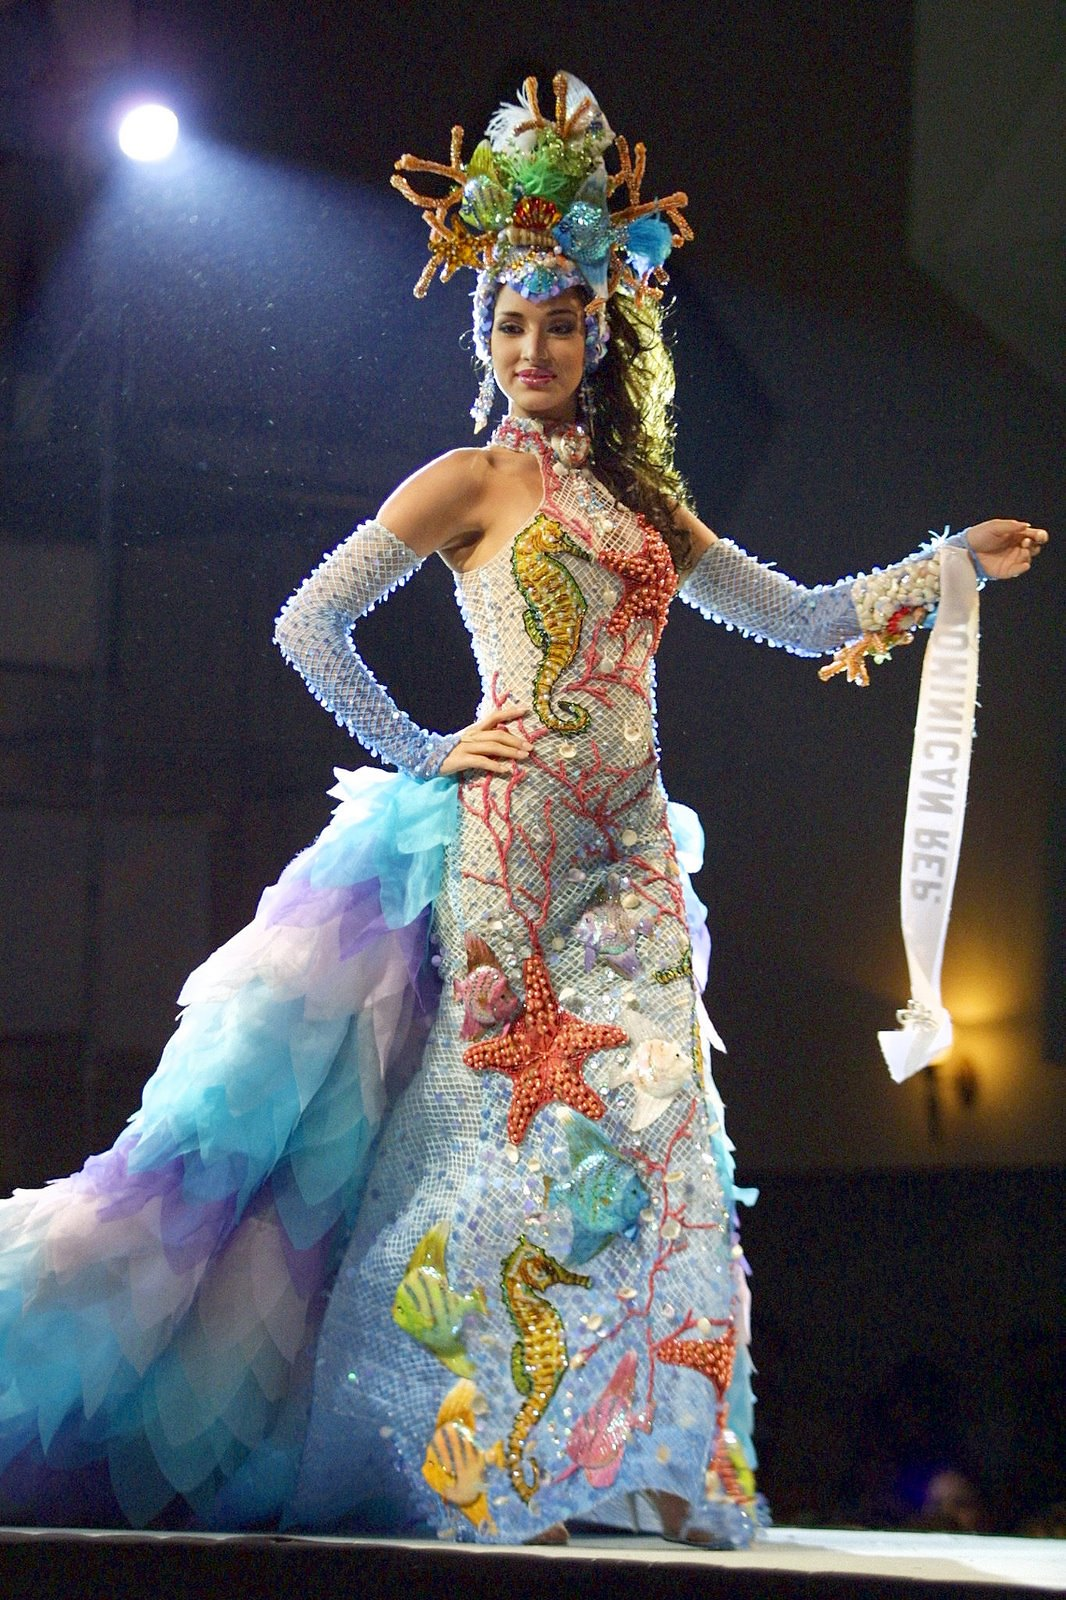 sede del Miss Universo 2020 2021